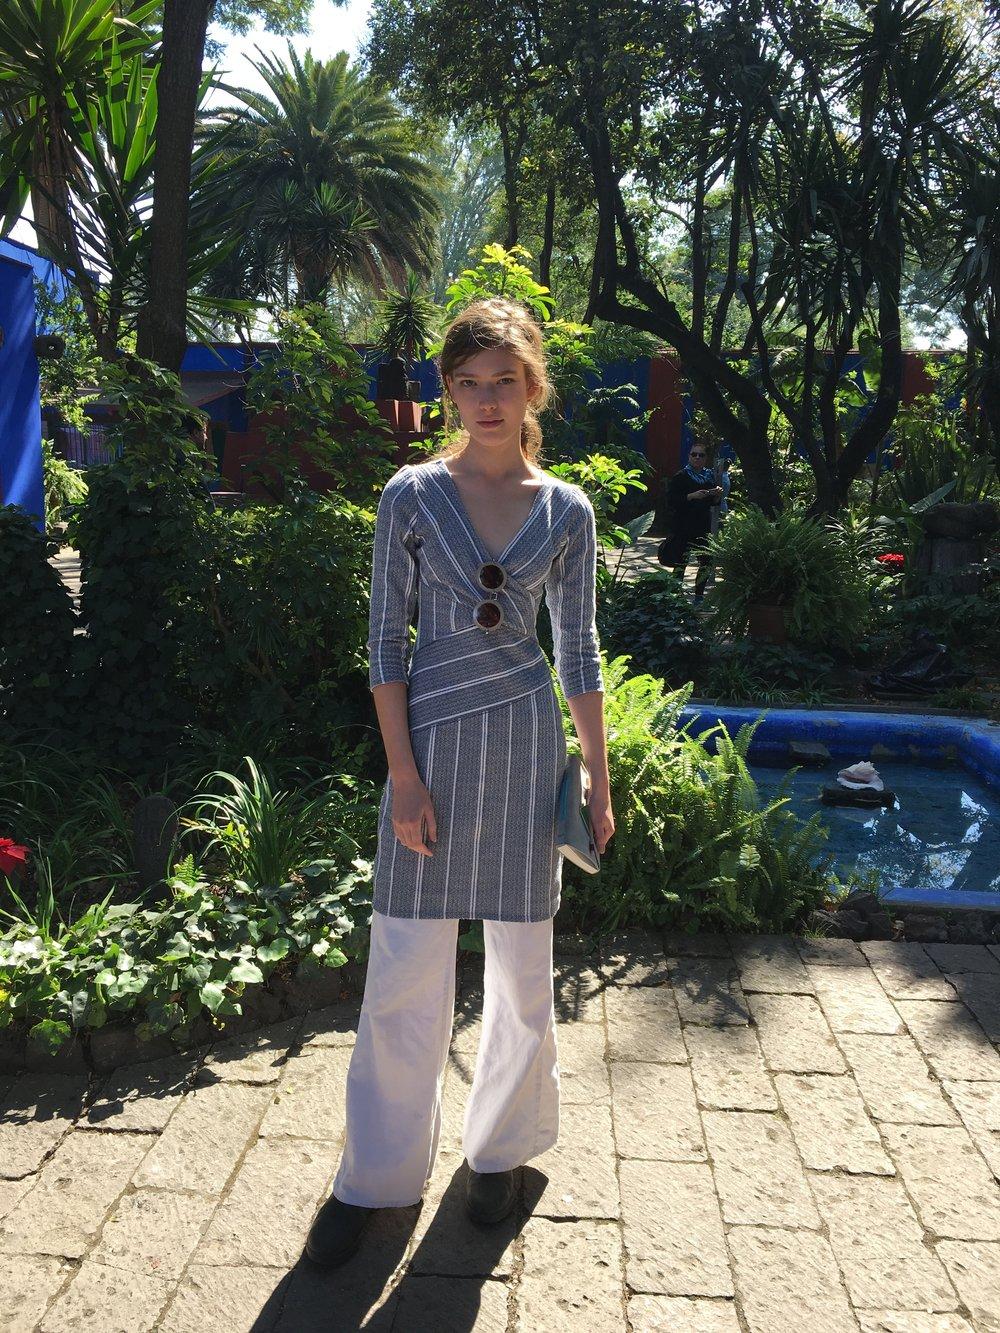 In Frida's Garden